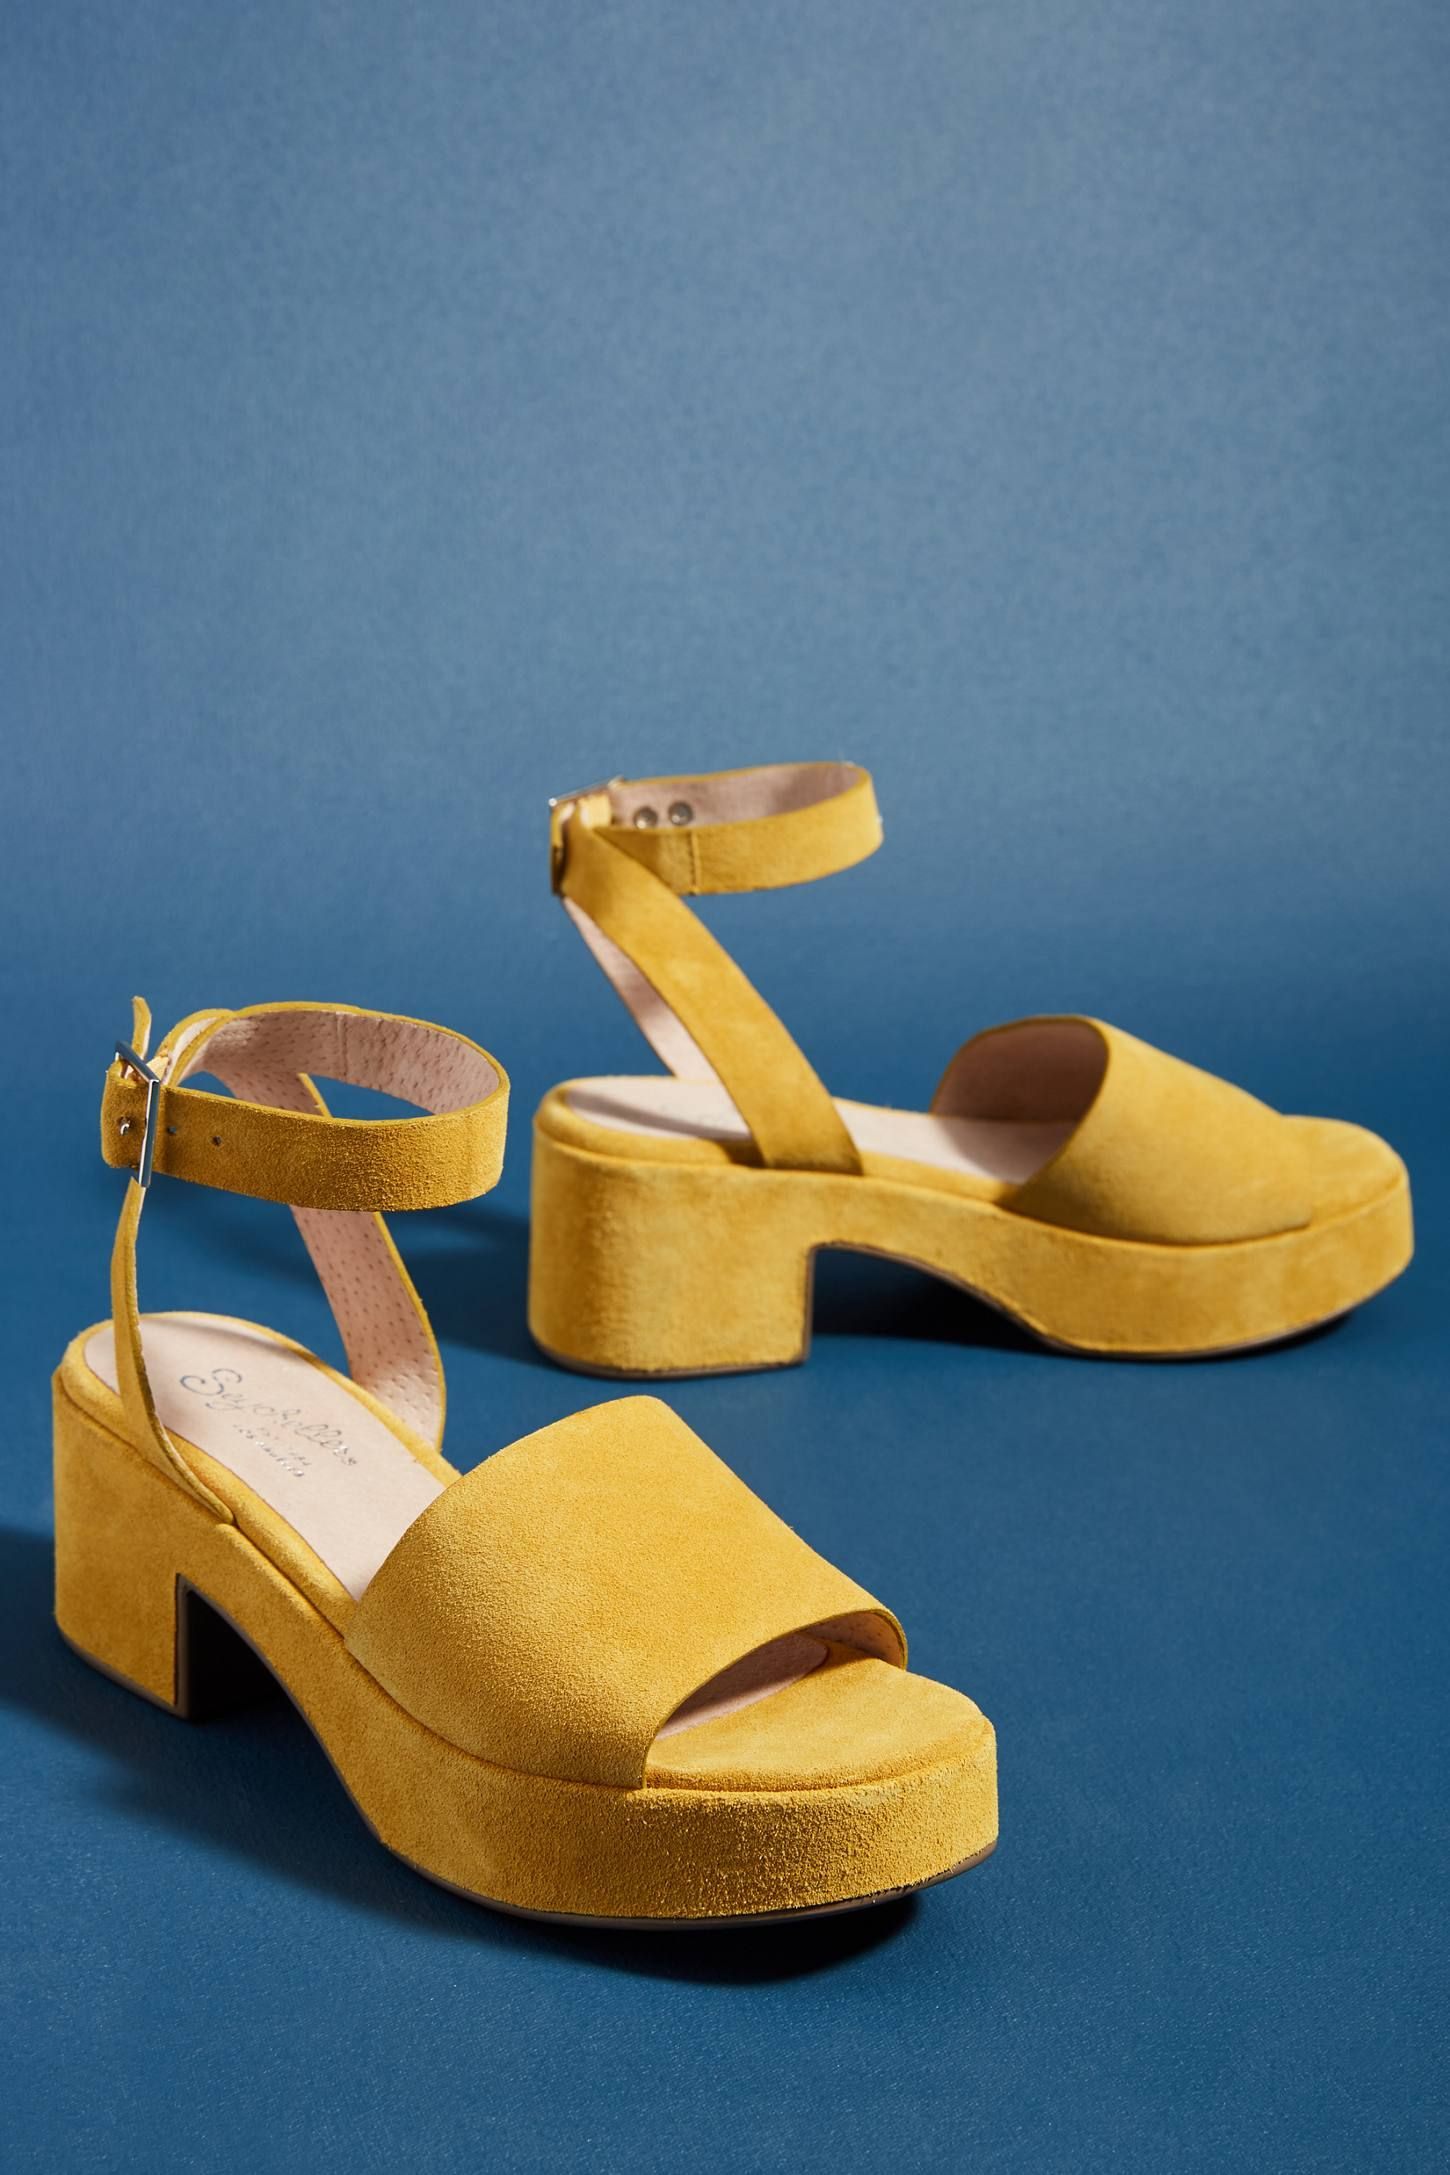 c151ec57520 Seychelles Calming Influence Platform Sandals